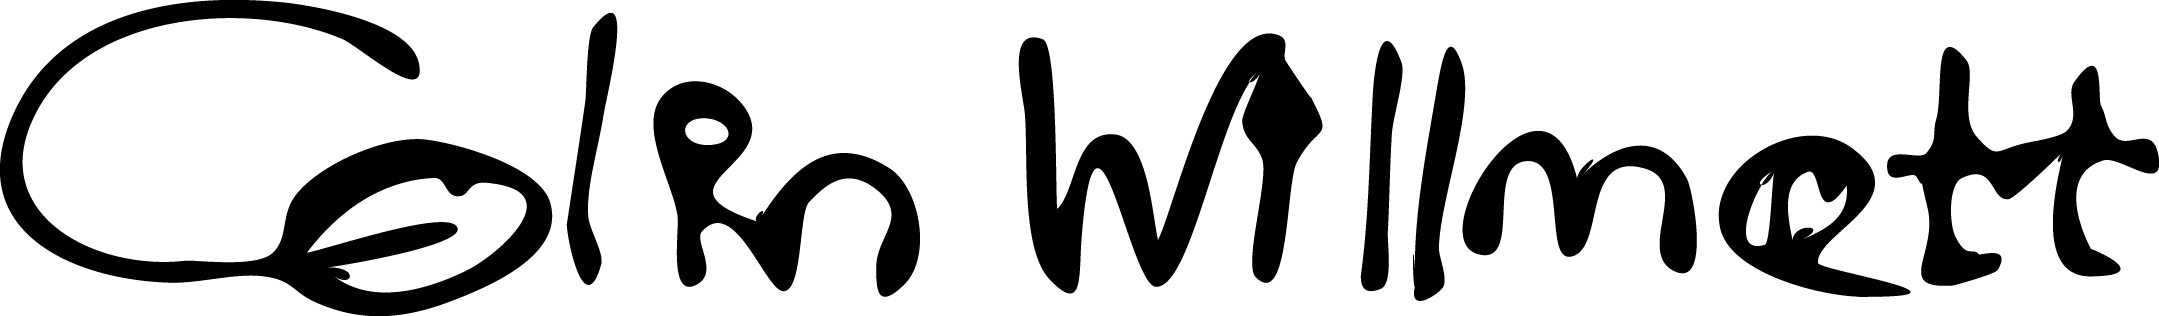 colin willmott Signature